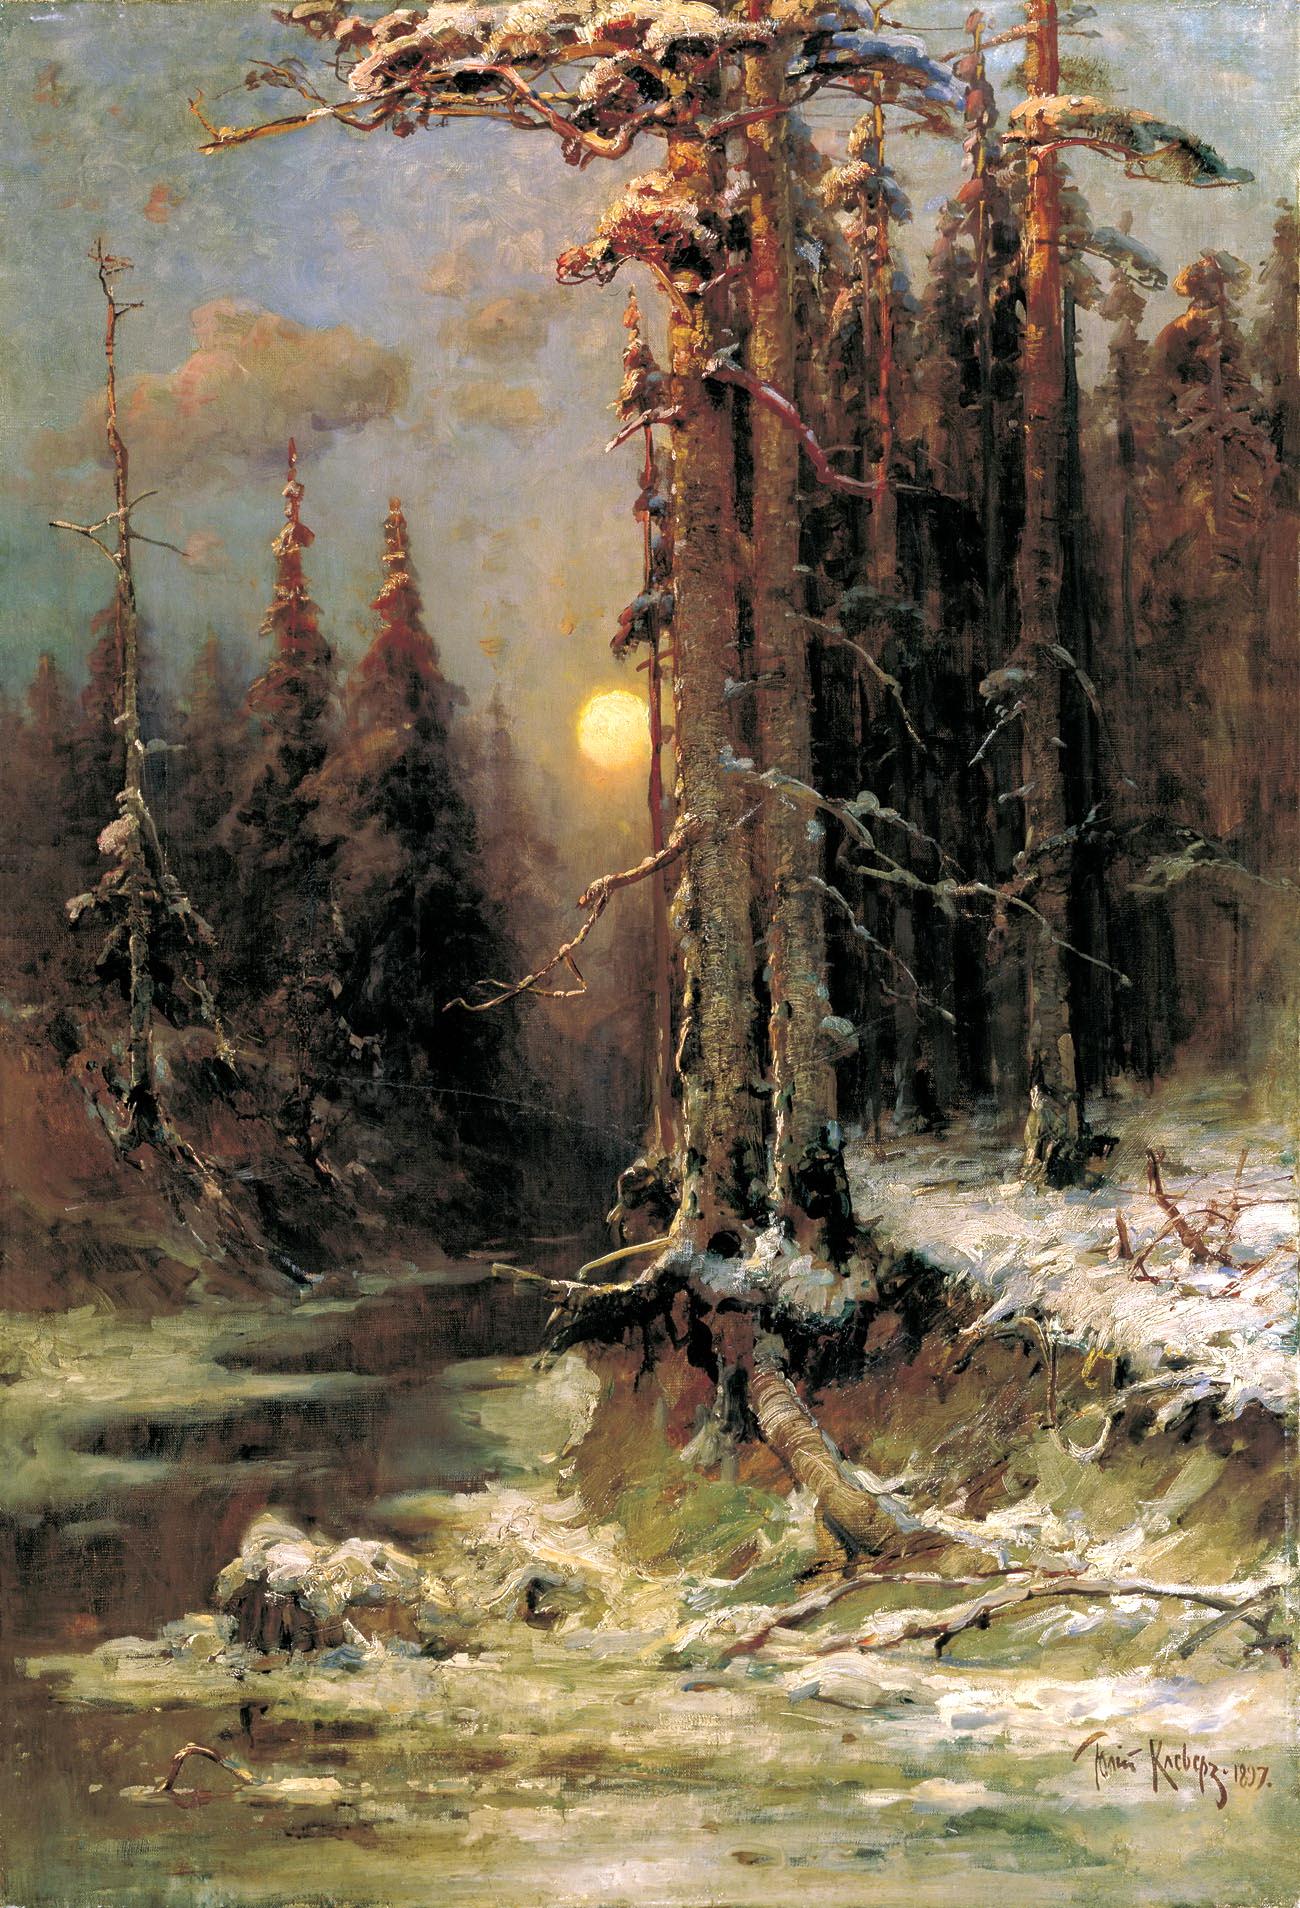 КЛЕВЕР Юлий - Закат солнца зимой. 1